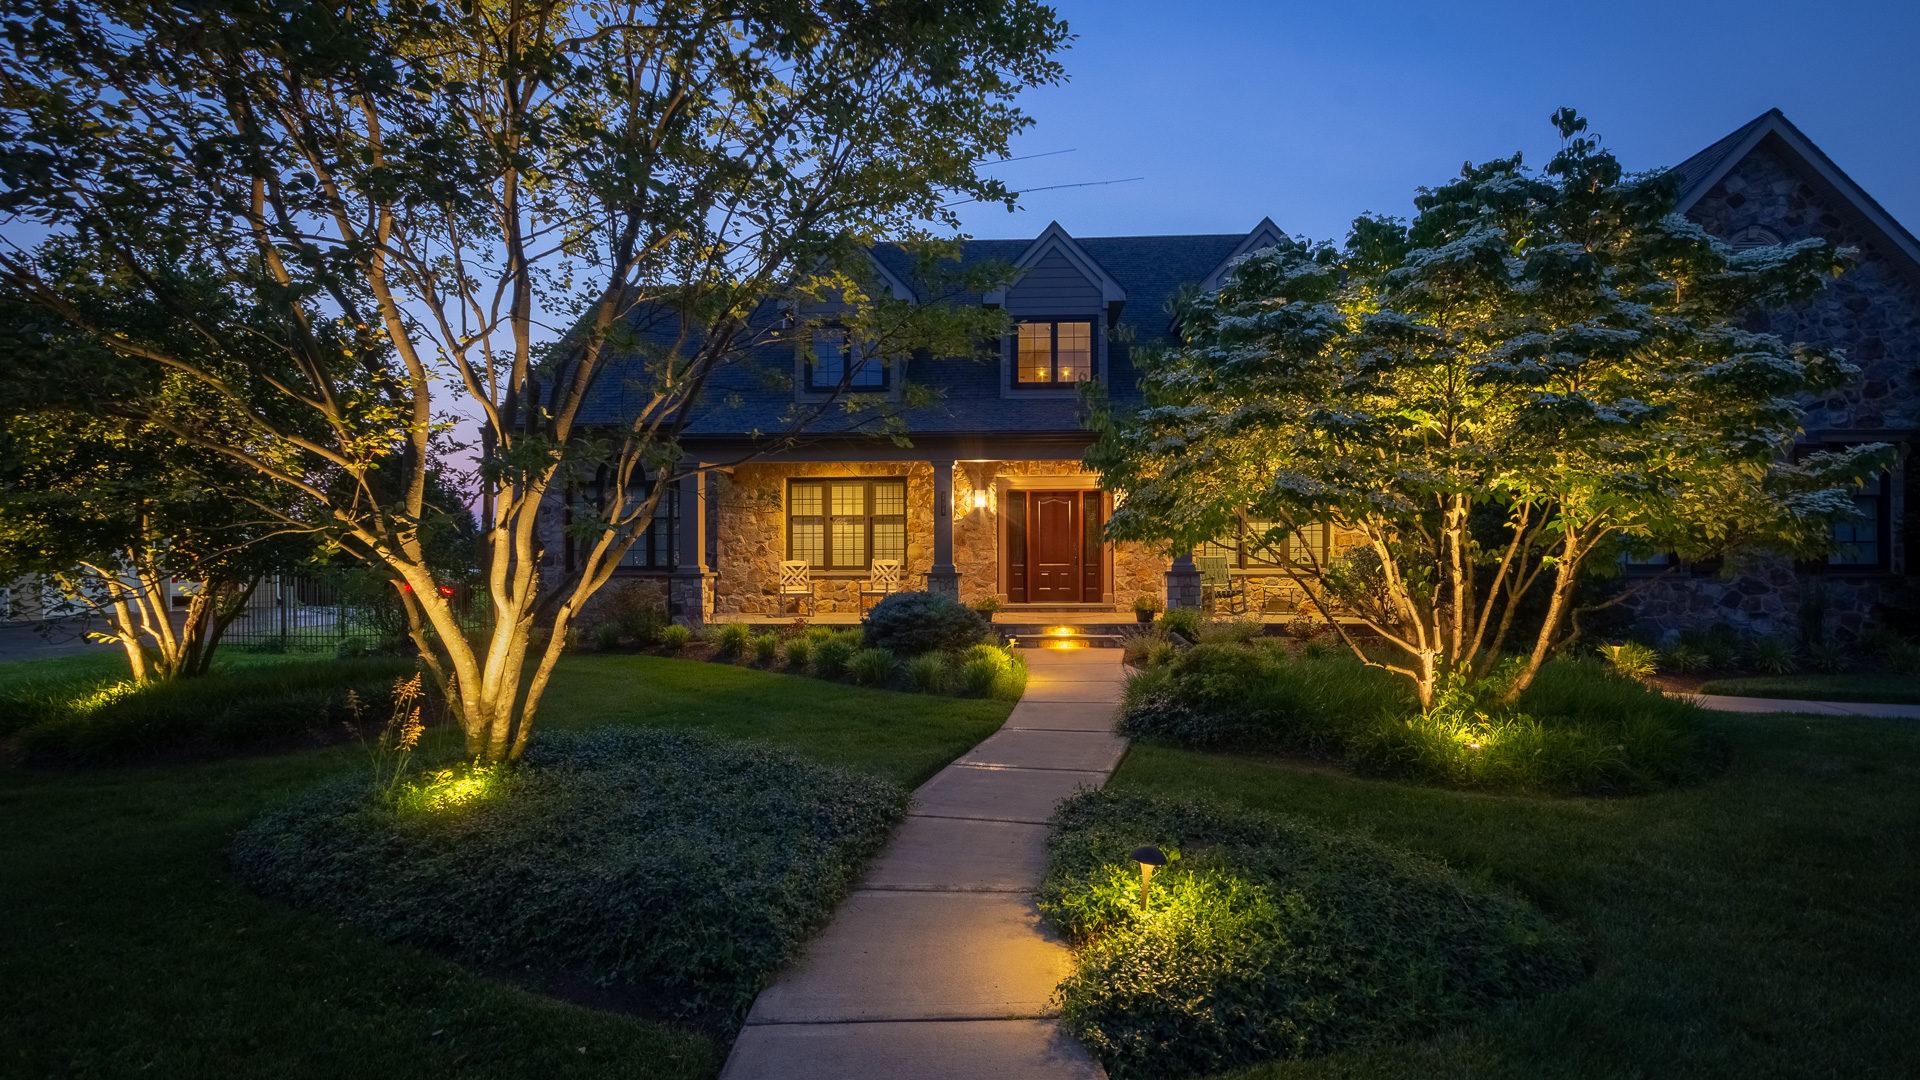 residential outdoor poe lighting